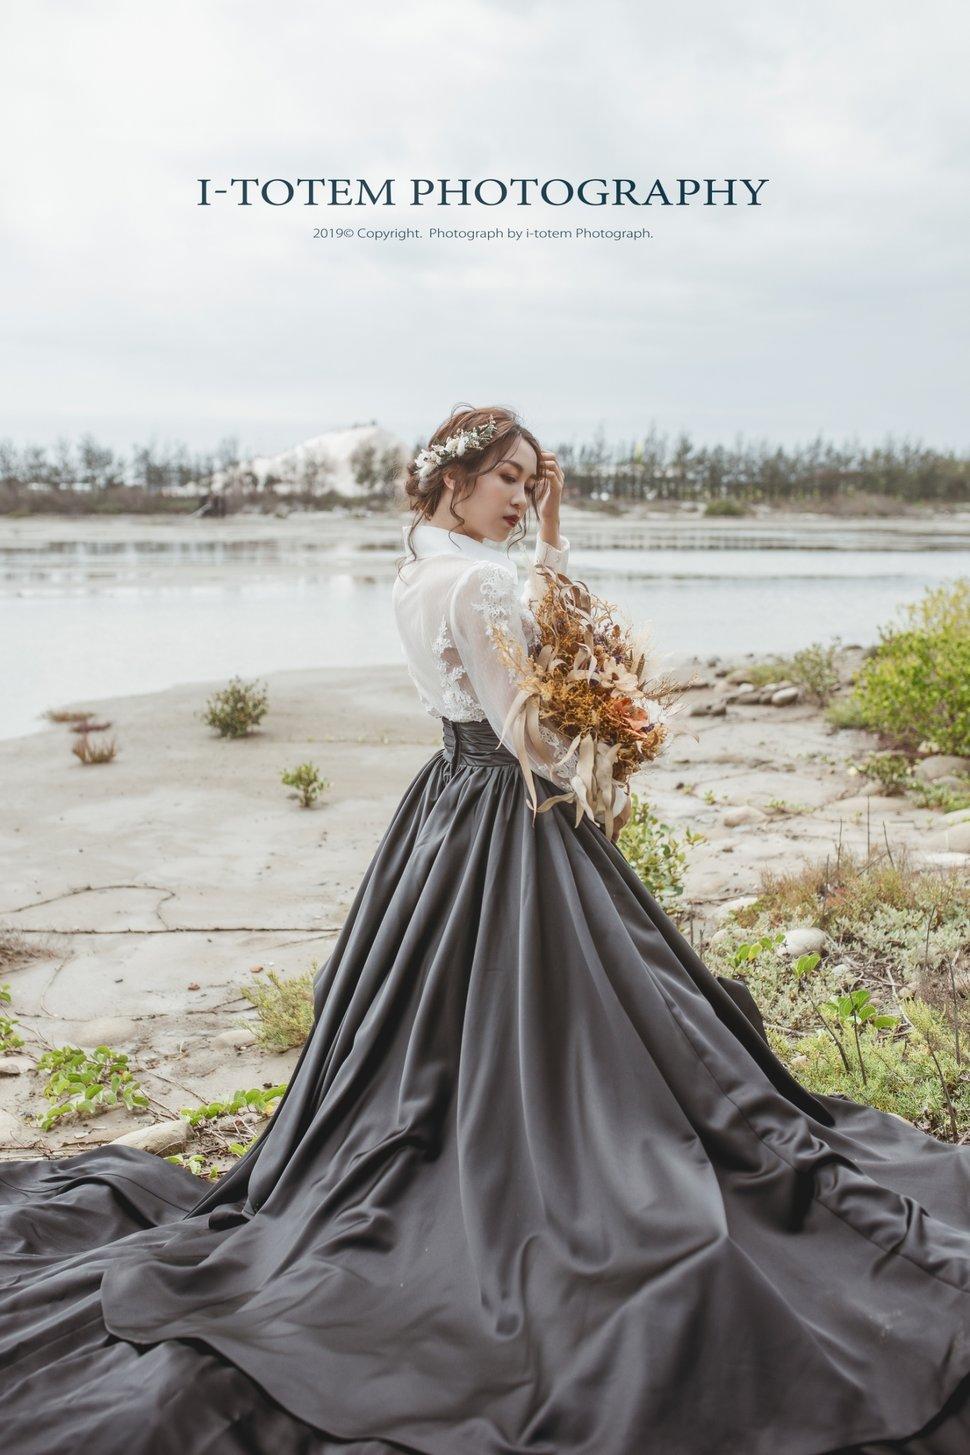 20190424_190424_0013 - Zona時尚美甲x新娘秘書整體造型工作室《結婚吧》